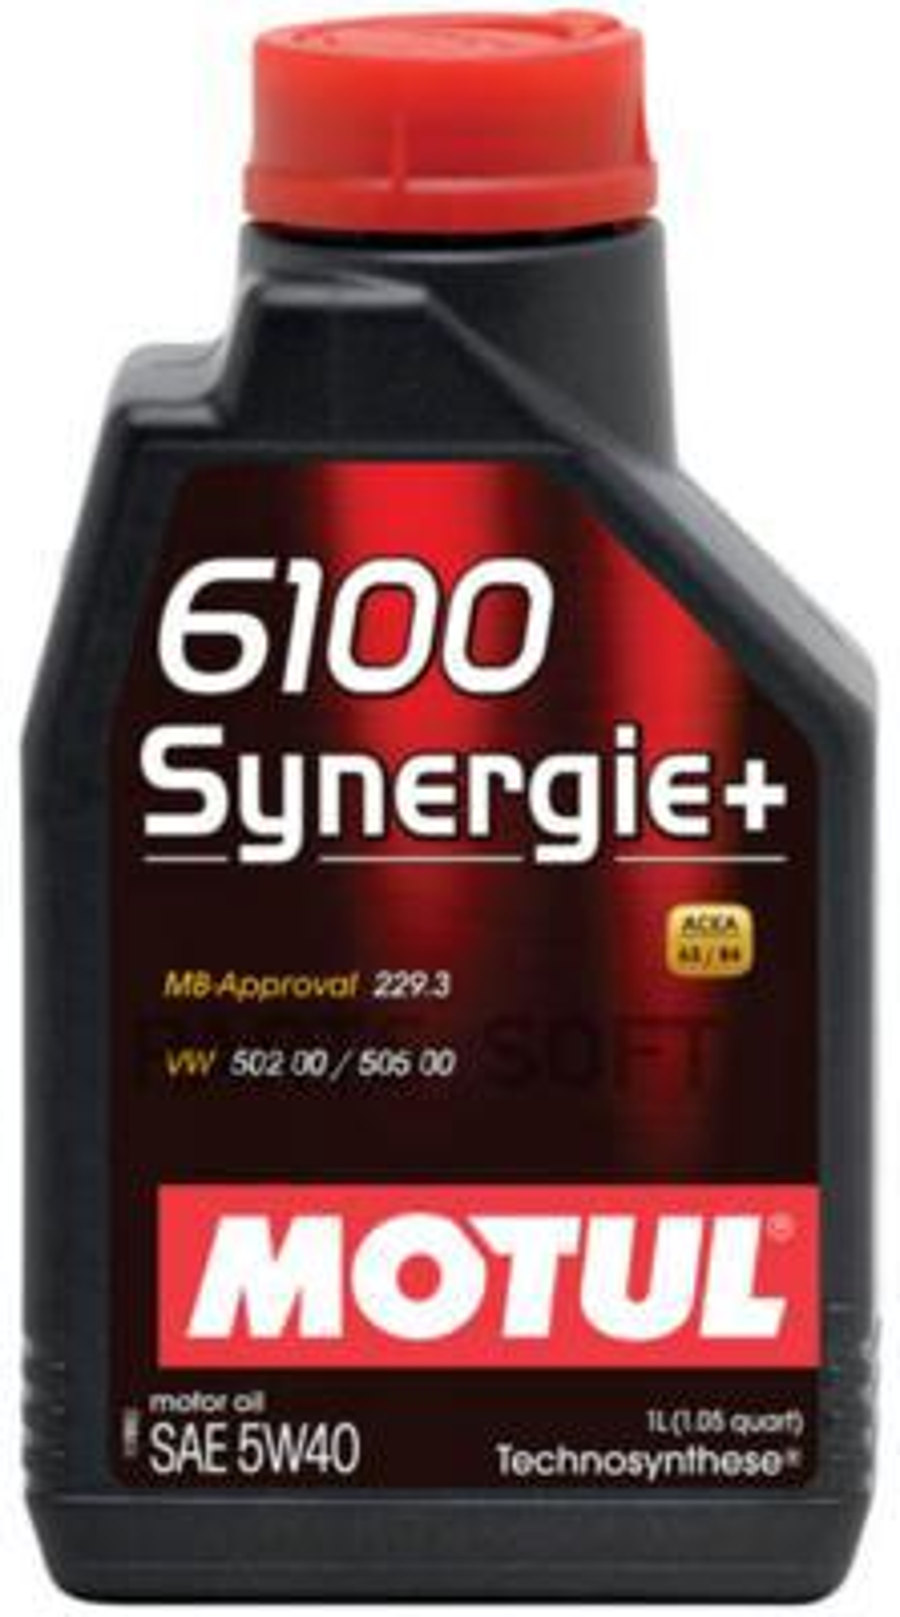 Масло моторное полусинтетическое 6100 Synergie+ 5W-40, 1л